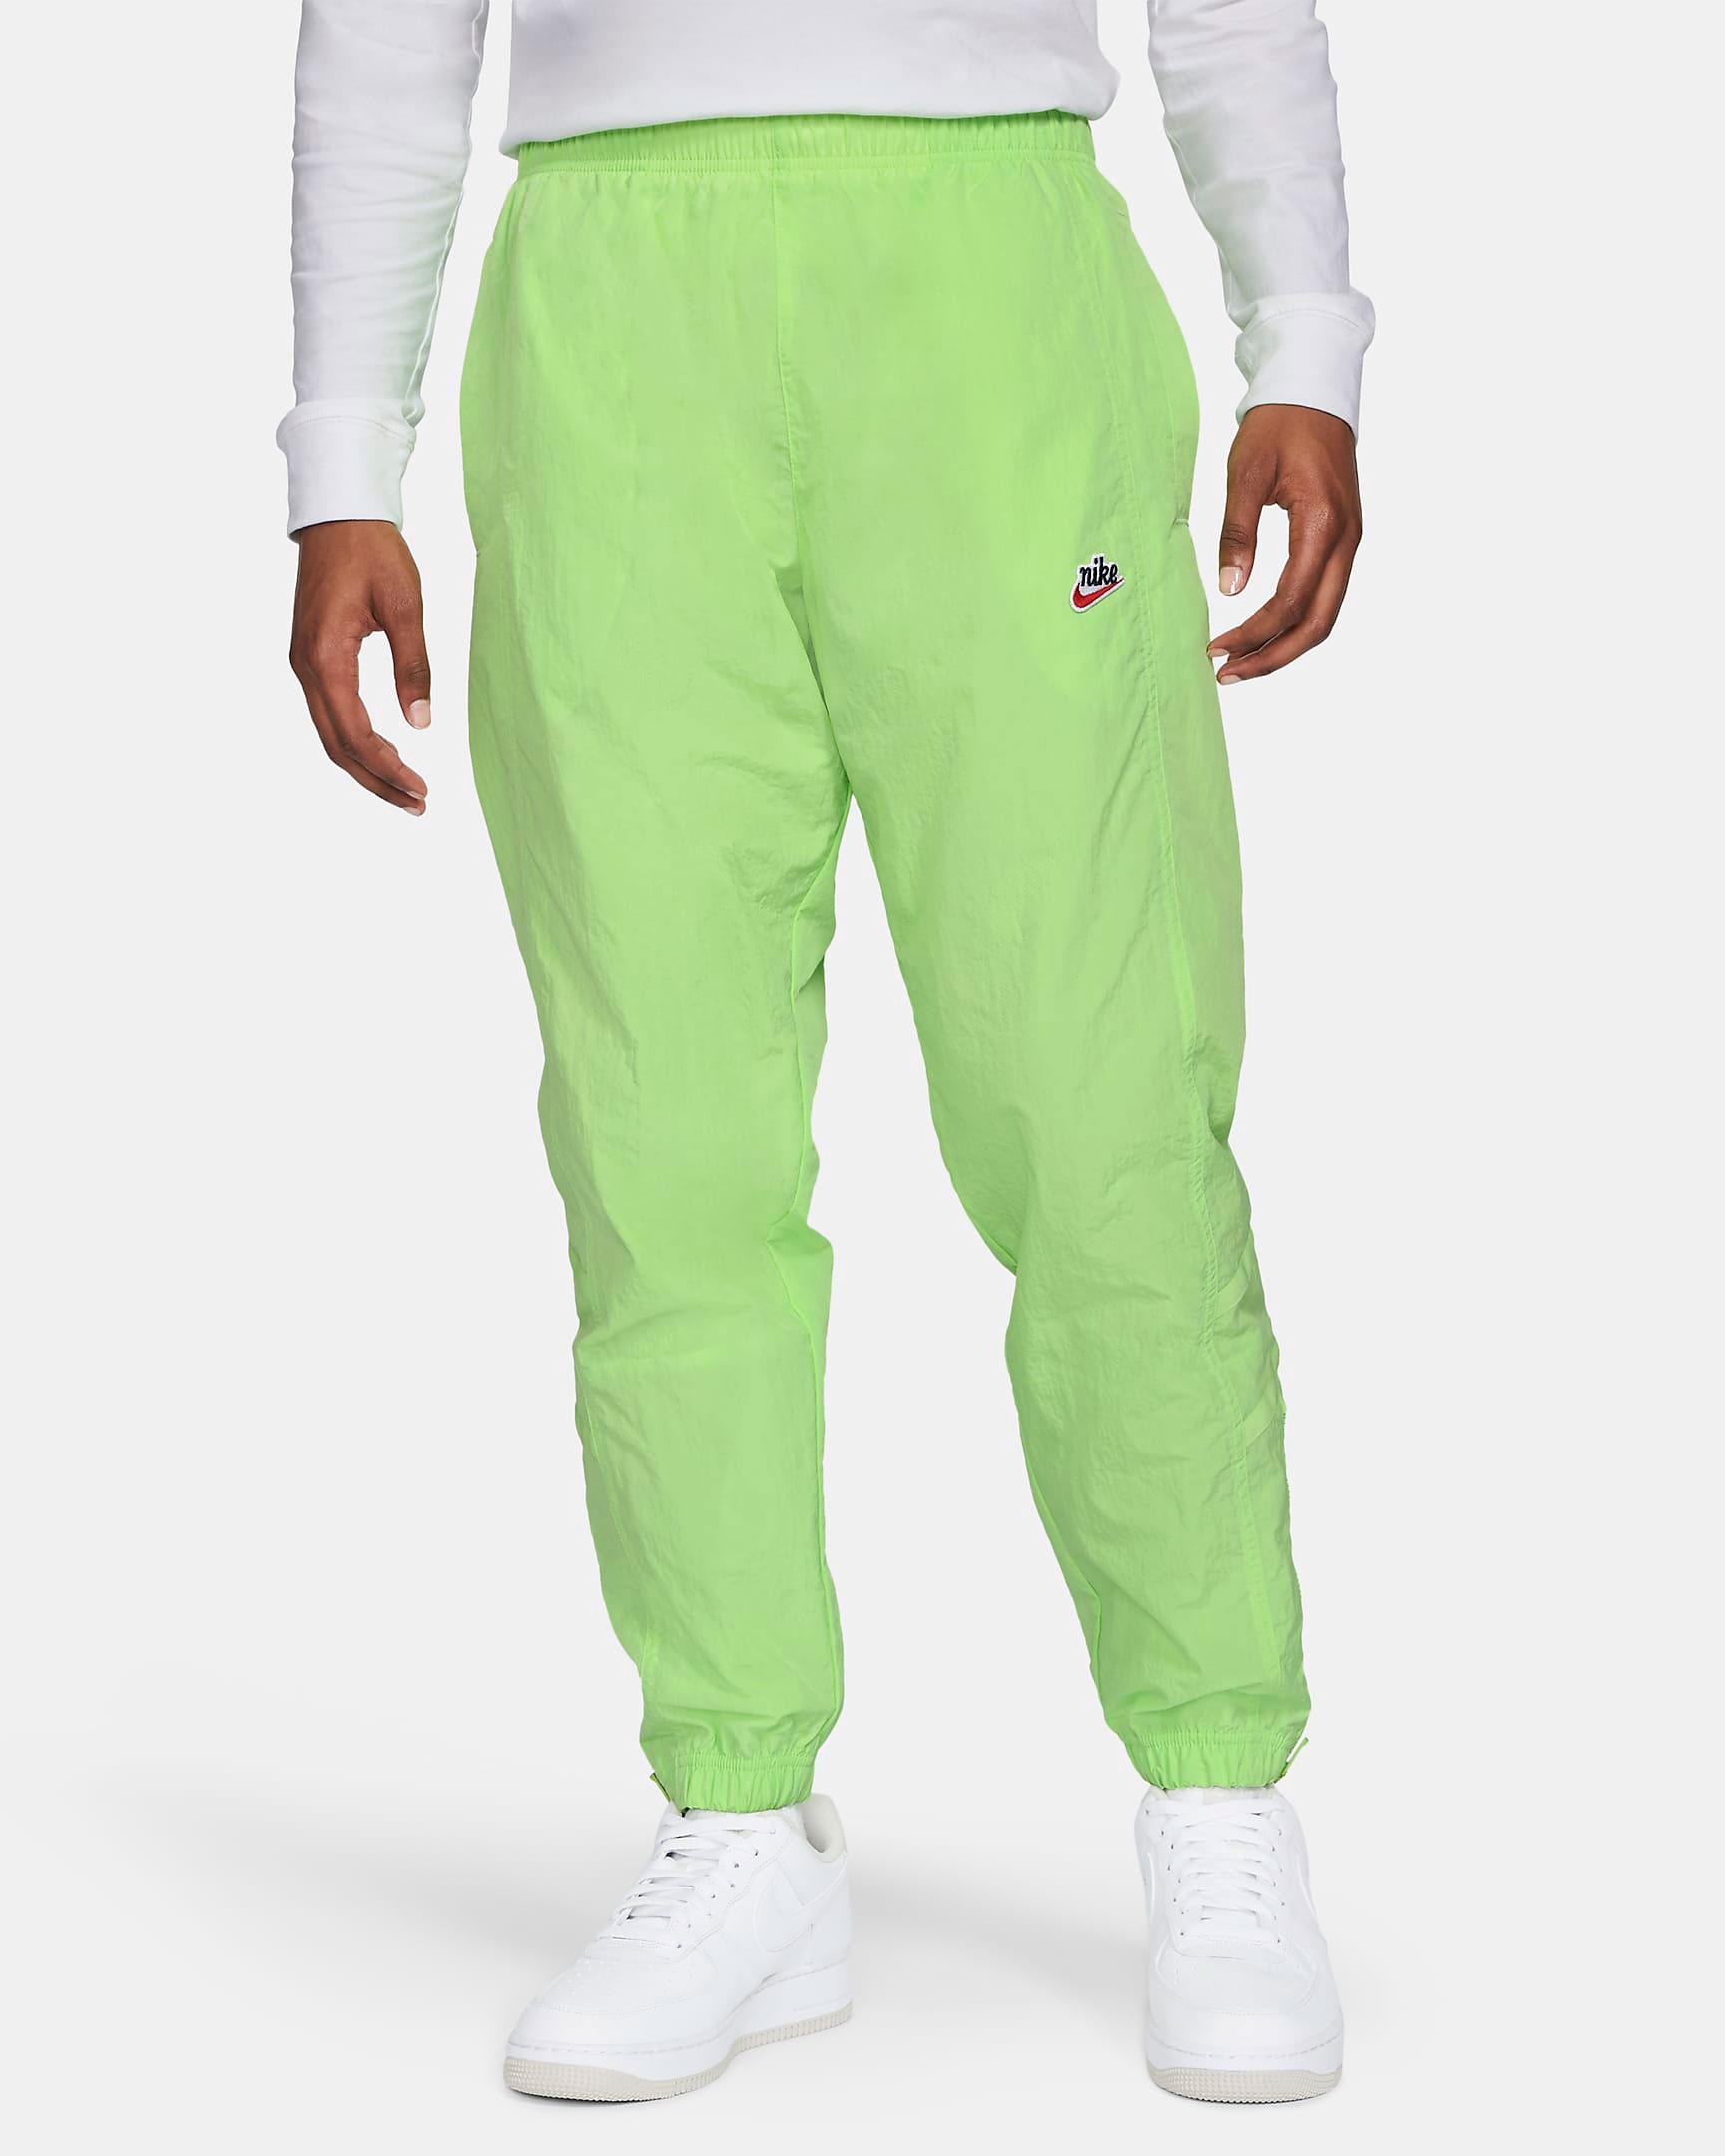 nike-lime-heritage-windrunner-pants